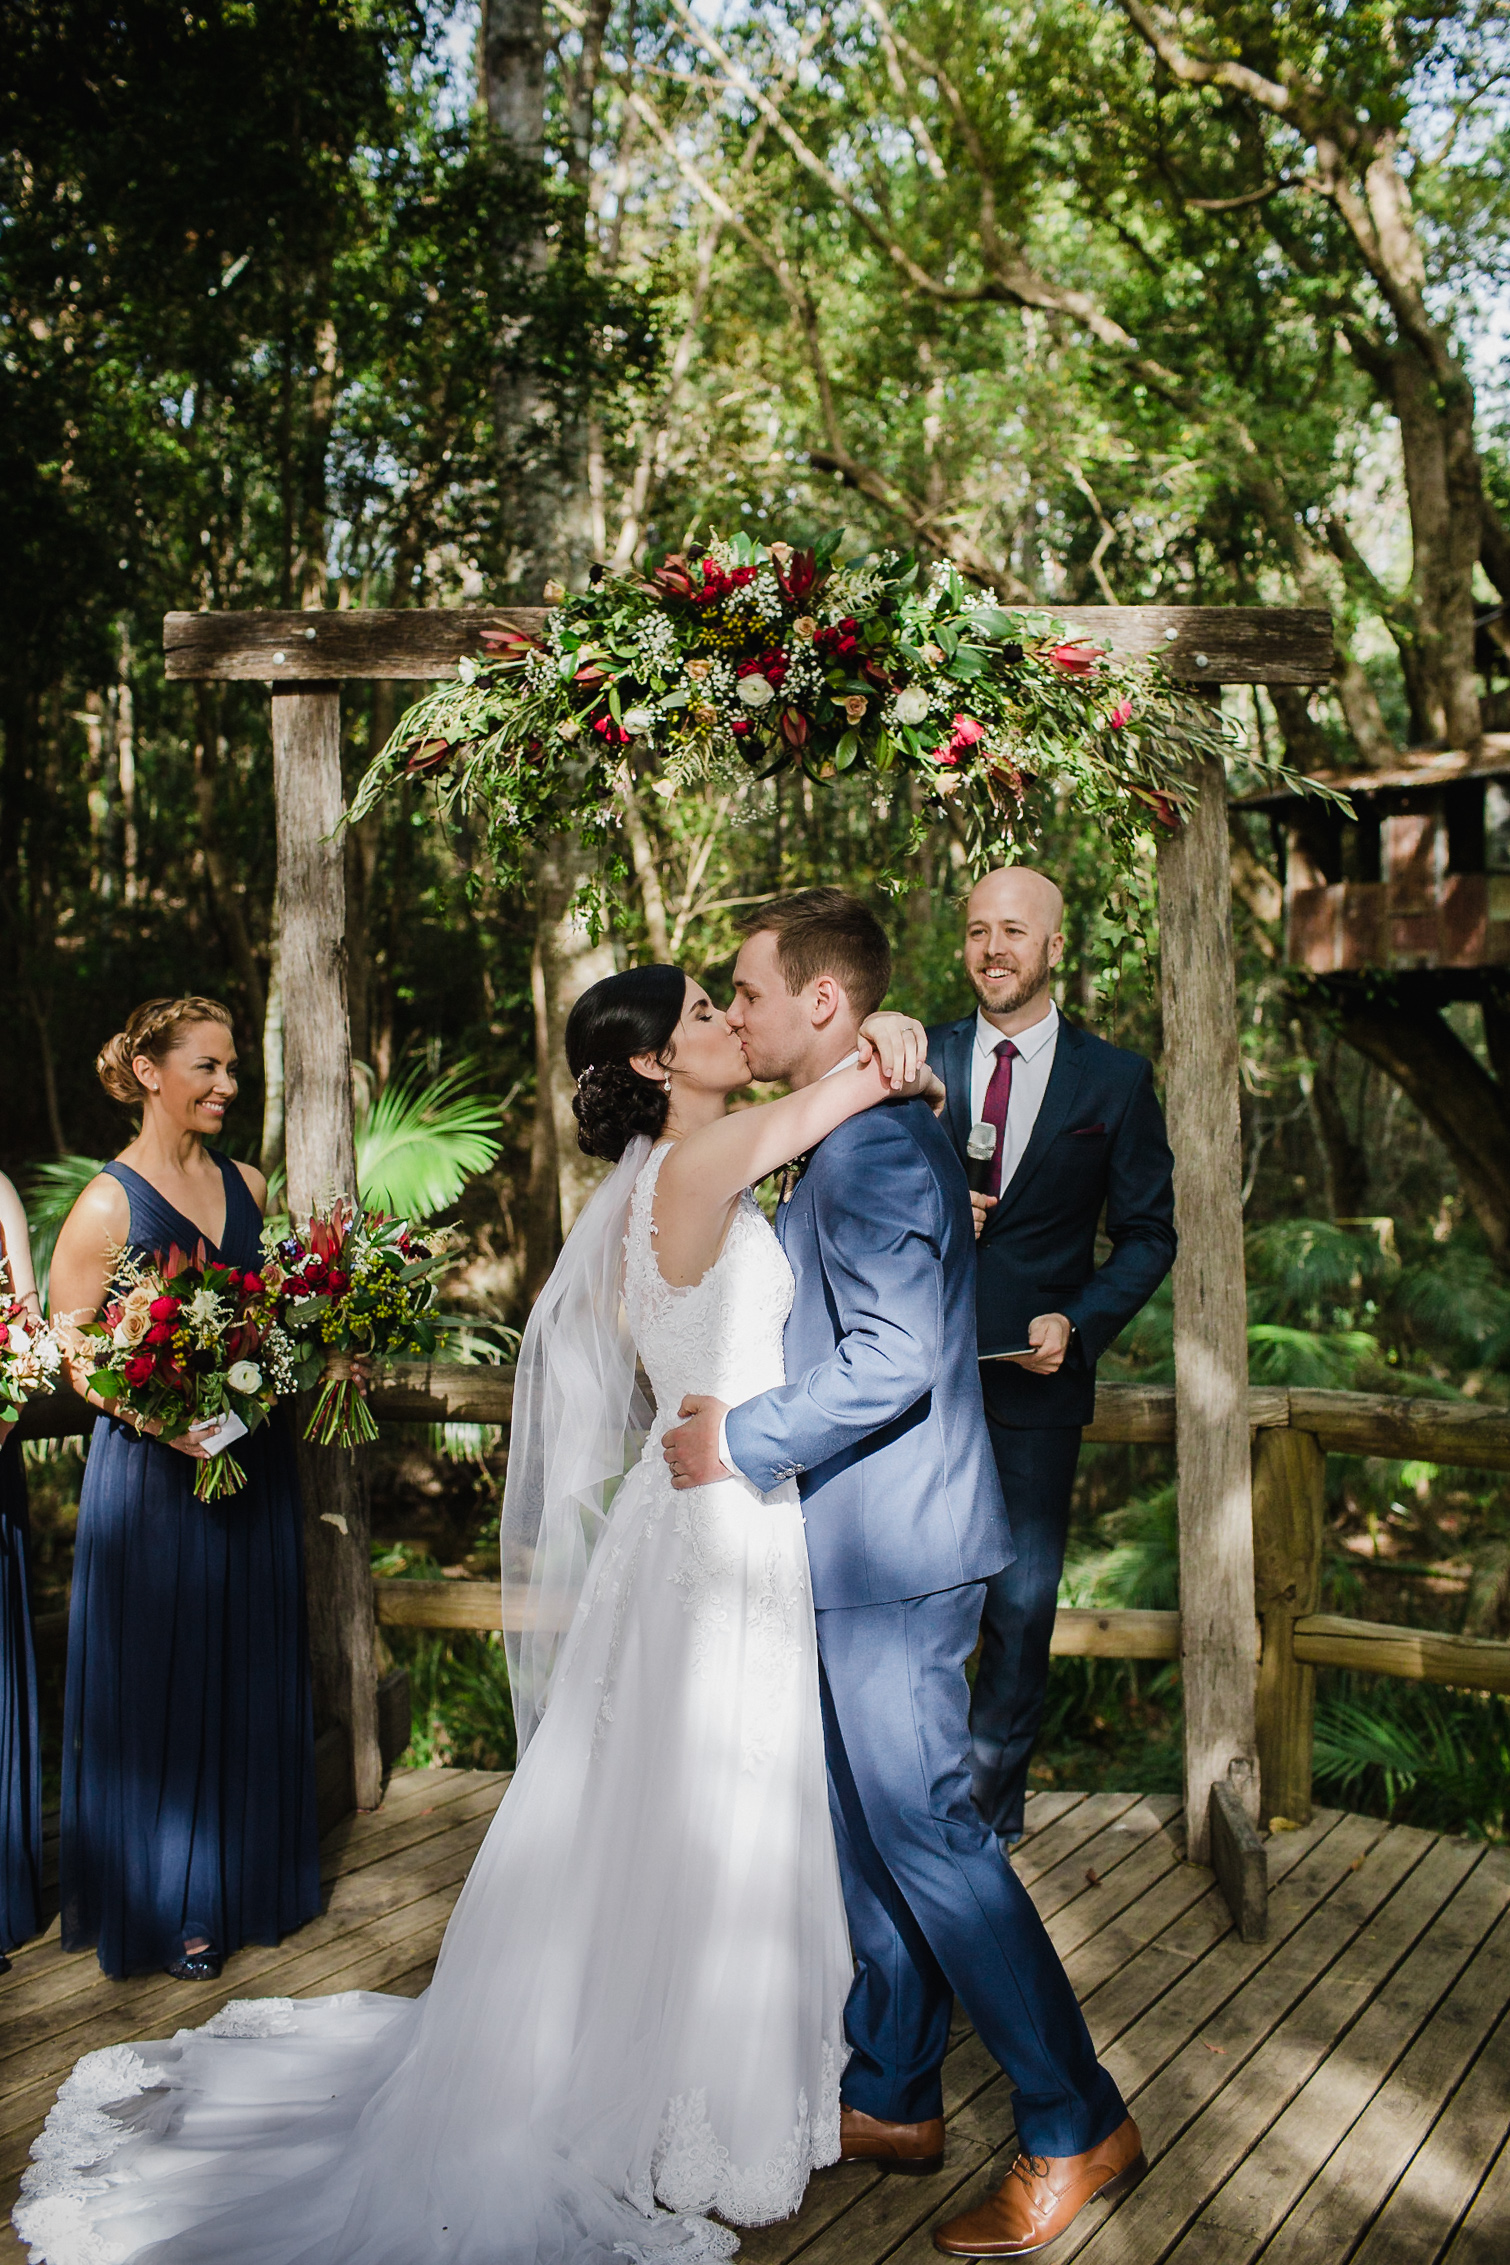 Boomerang_Farm_Gold_Coast_Wedding_Photography-108.jpg